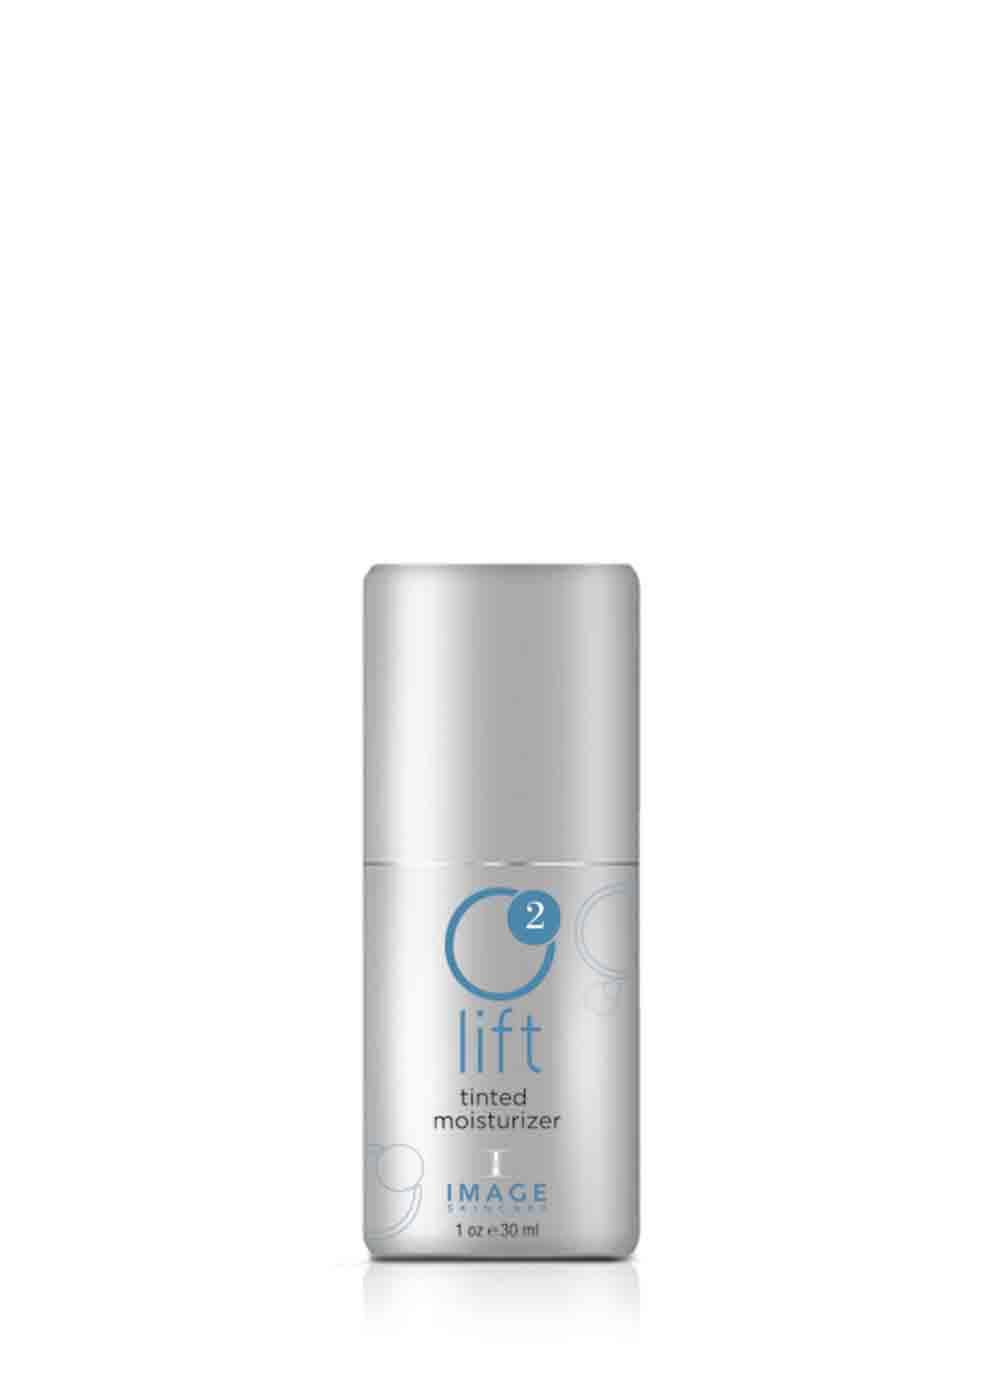 O2 LIFT tinted moisturizer einté hydratant